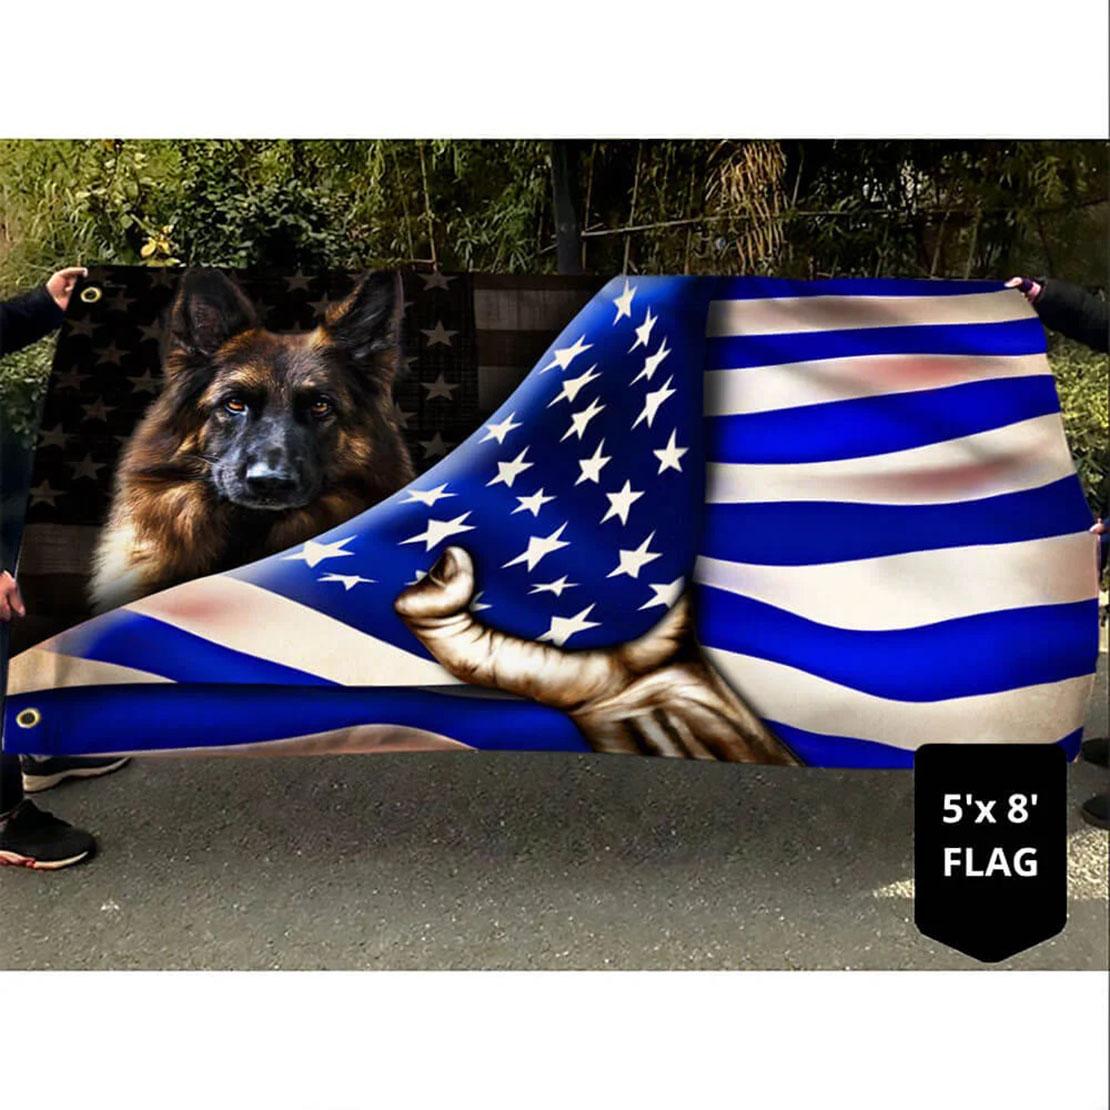 German Shepherd Police Dog K9 The Thin Blue Line Flag